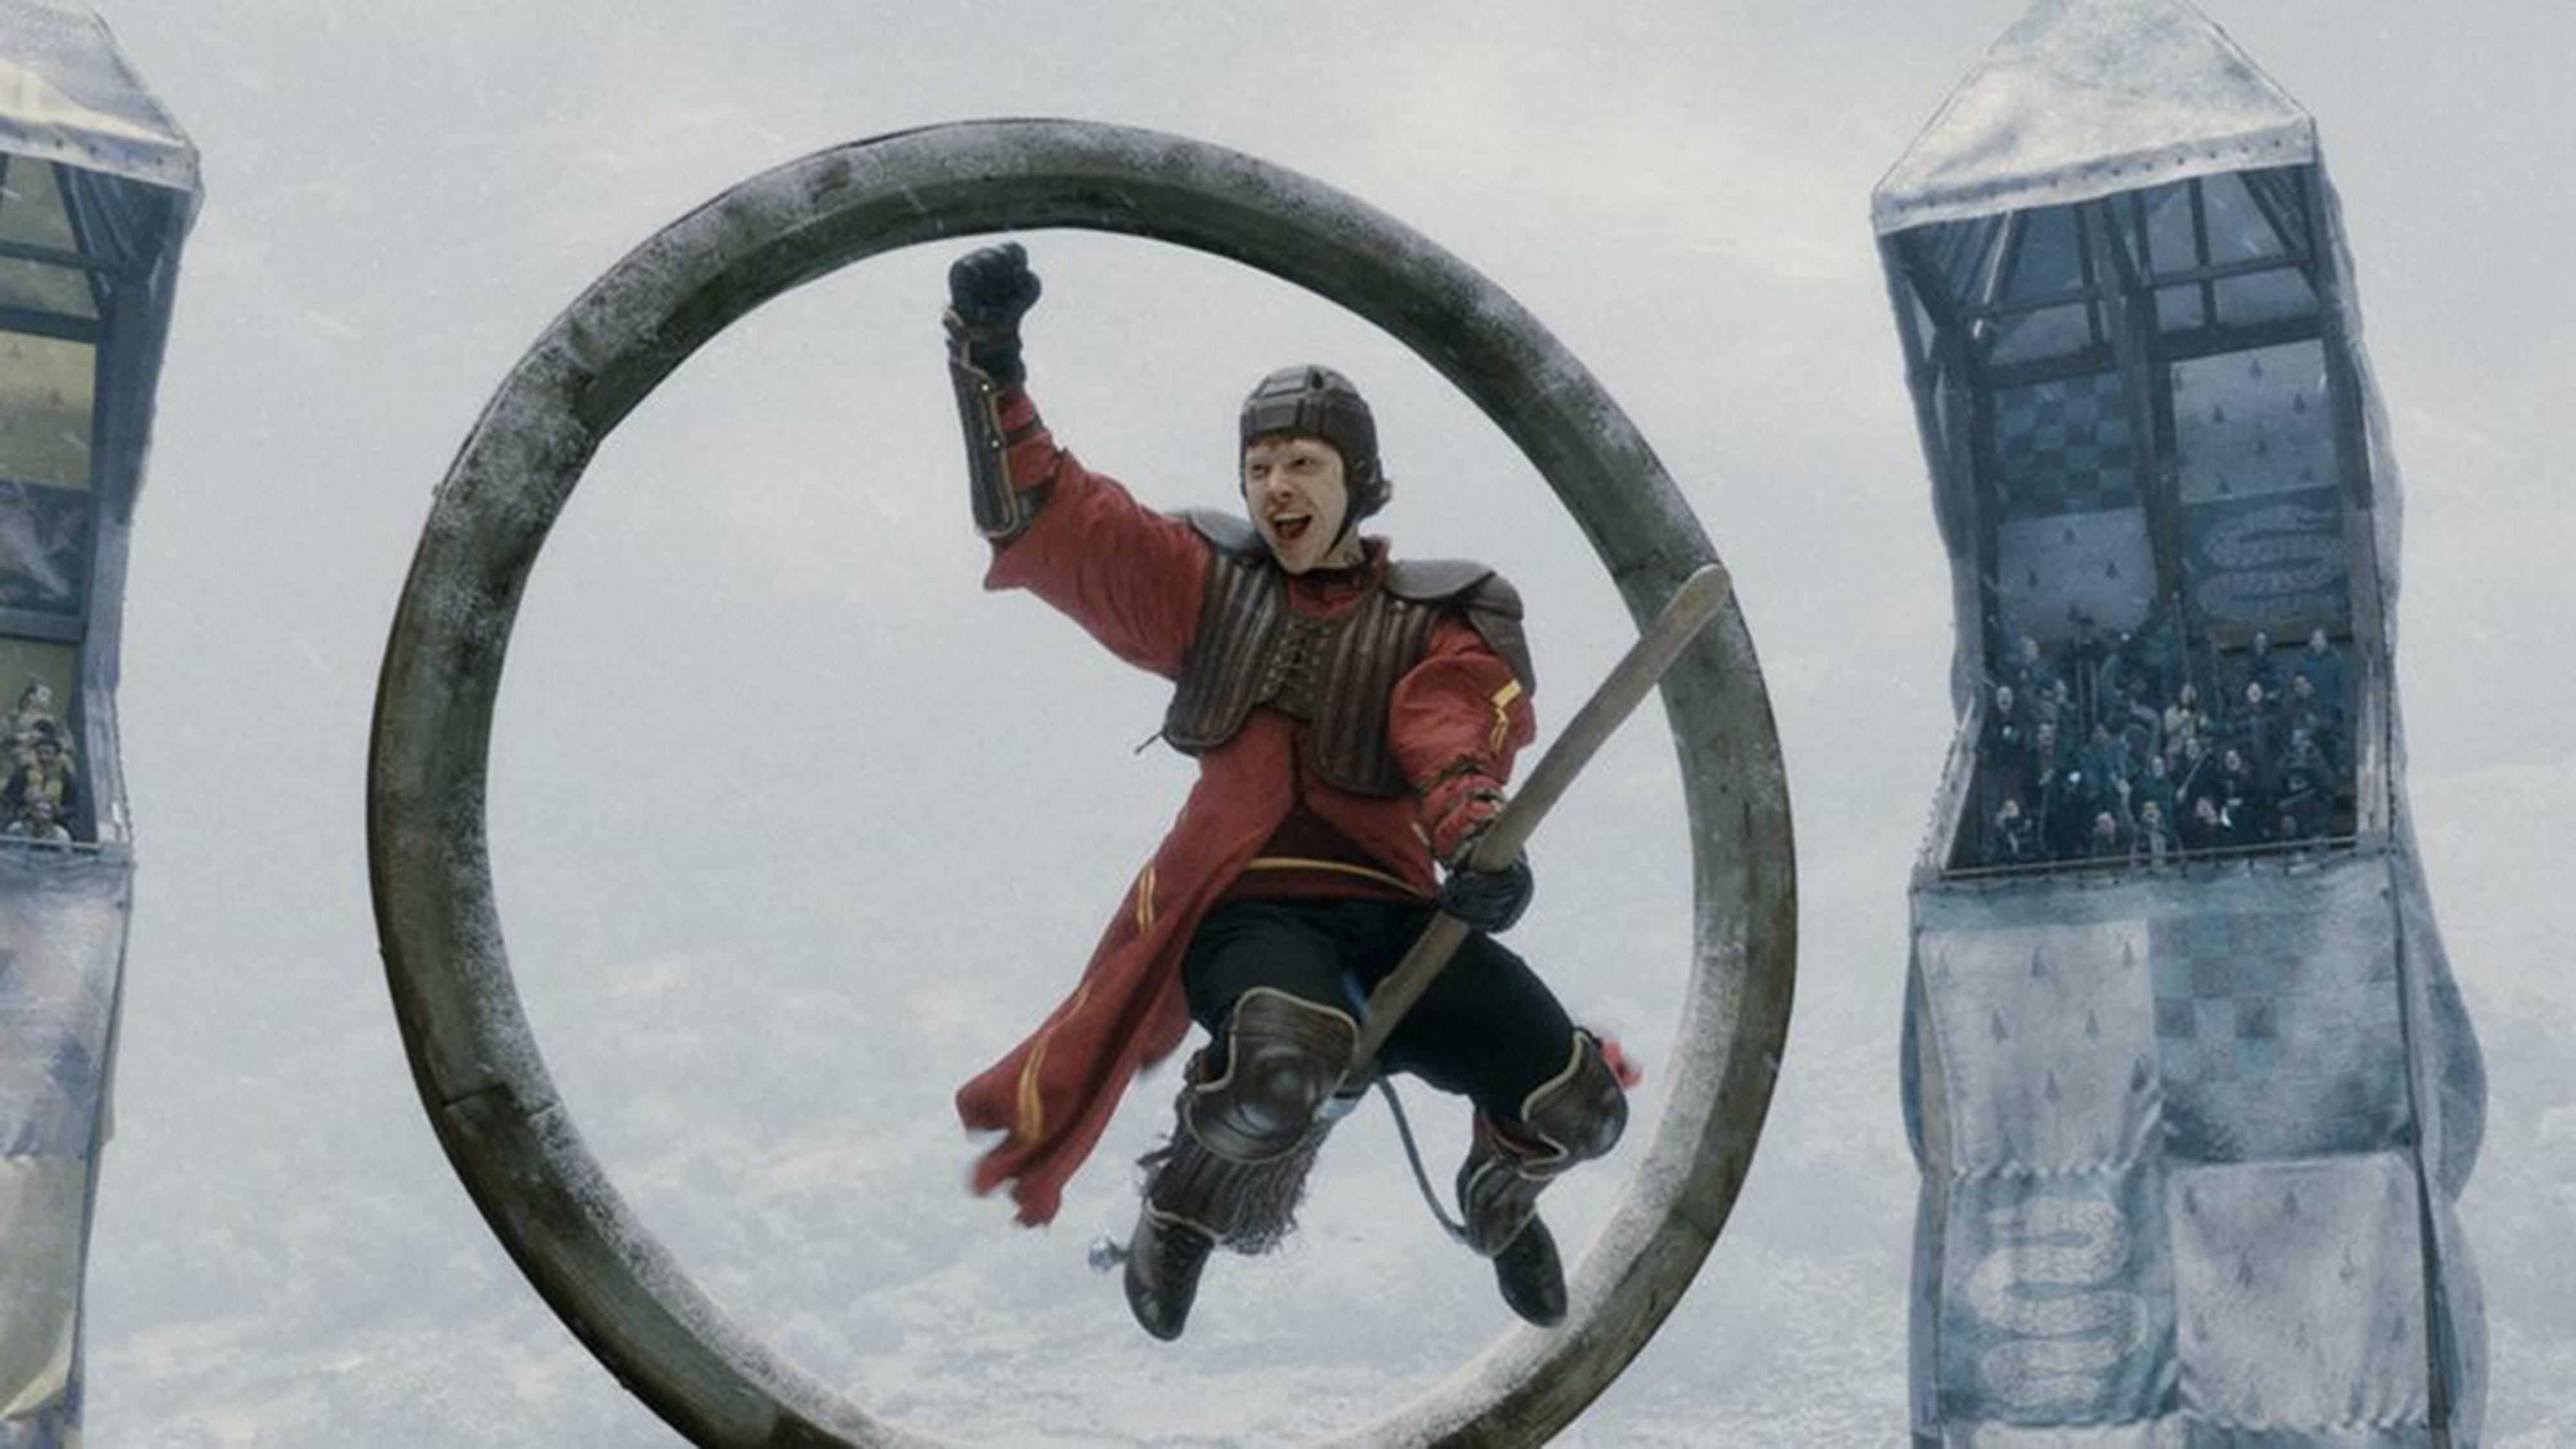 Quidditch Casts Spell Over Intramurals